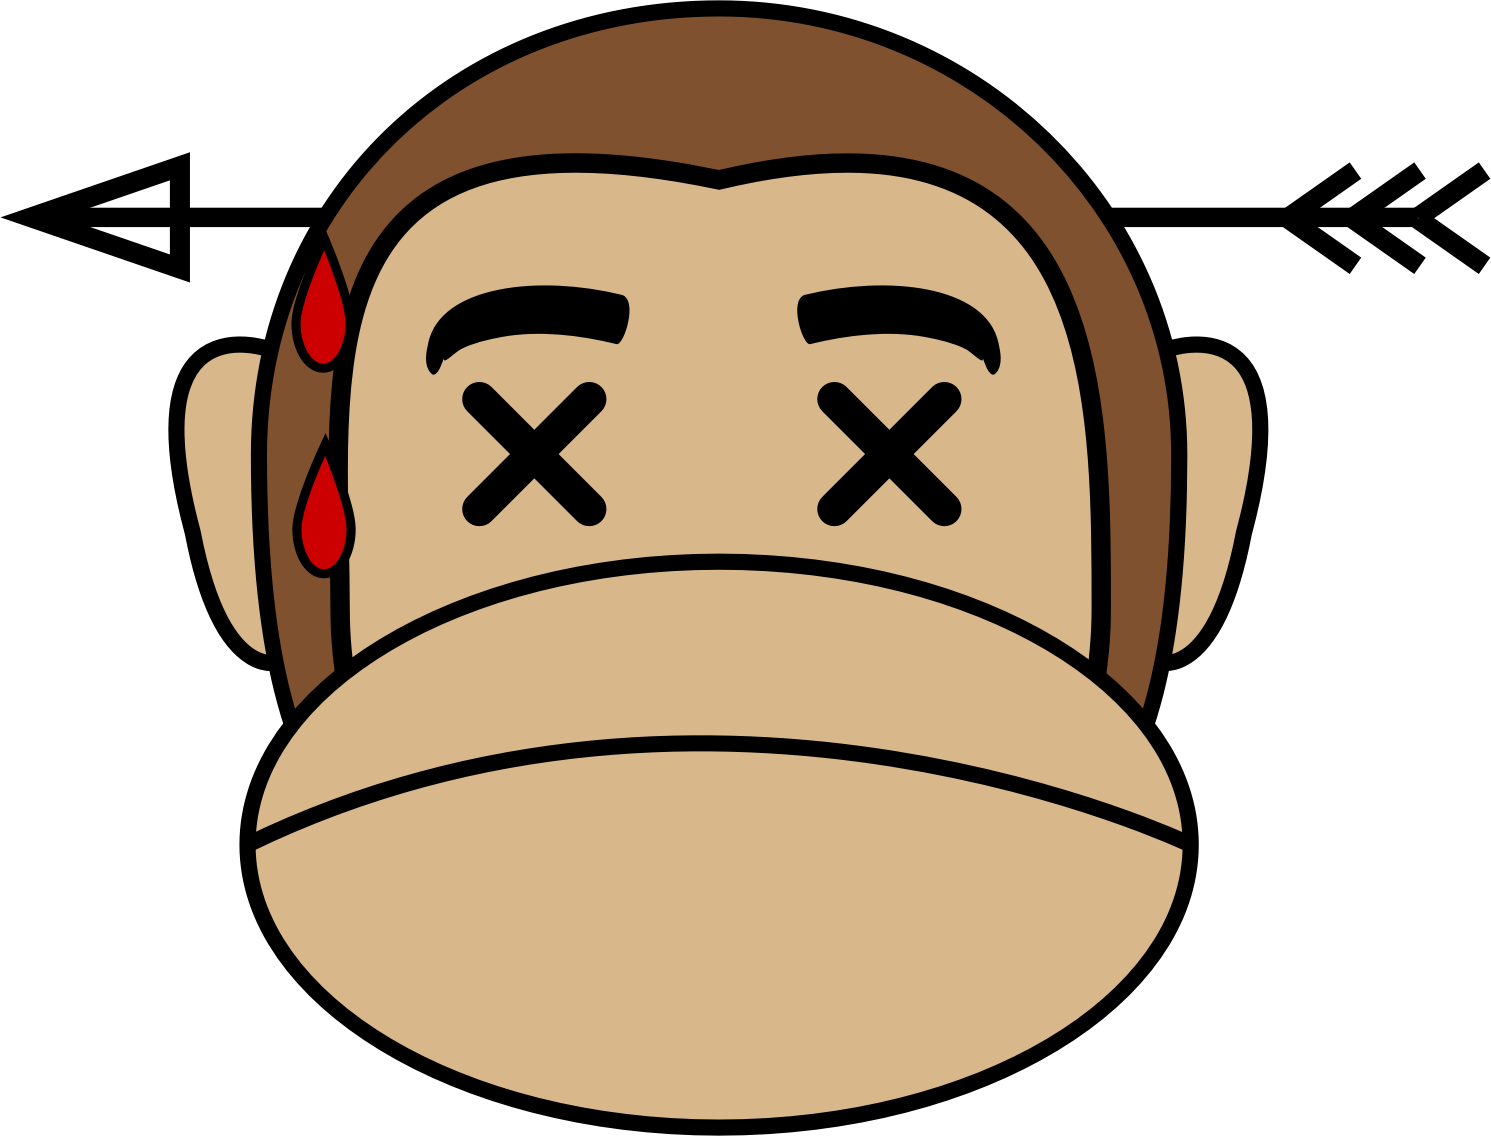 clip black and white Monkey emoji dead big. Ape clipart monket